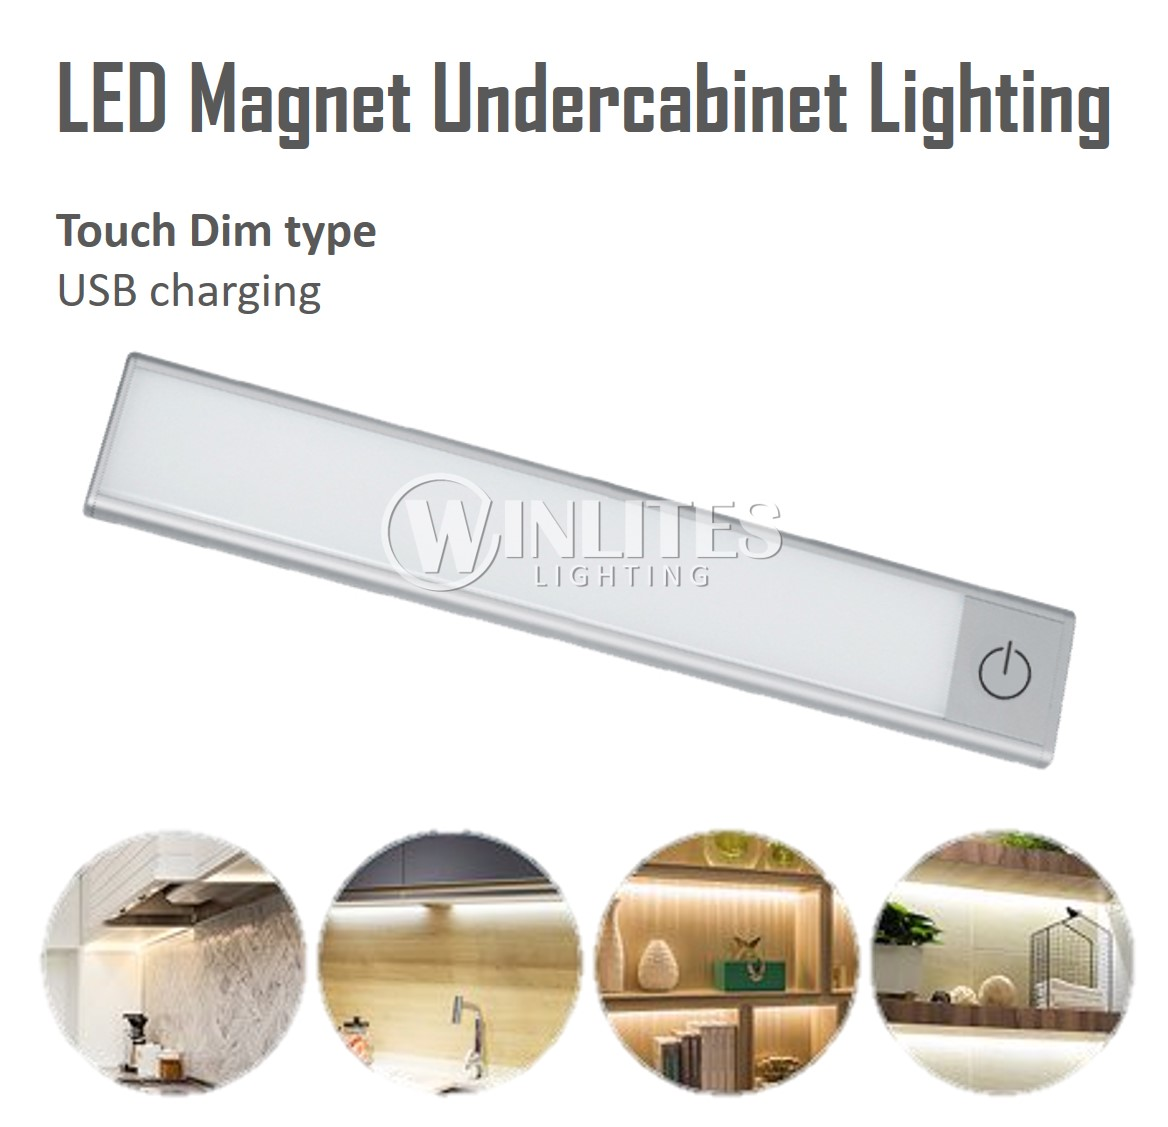 Ultra Slim Magnet Light - Touch Dim